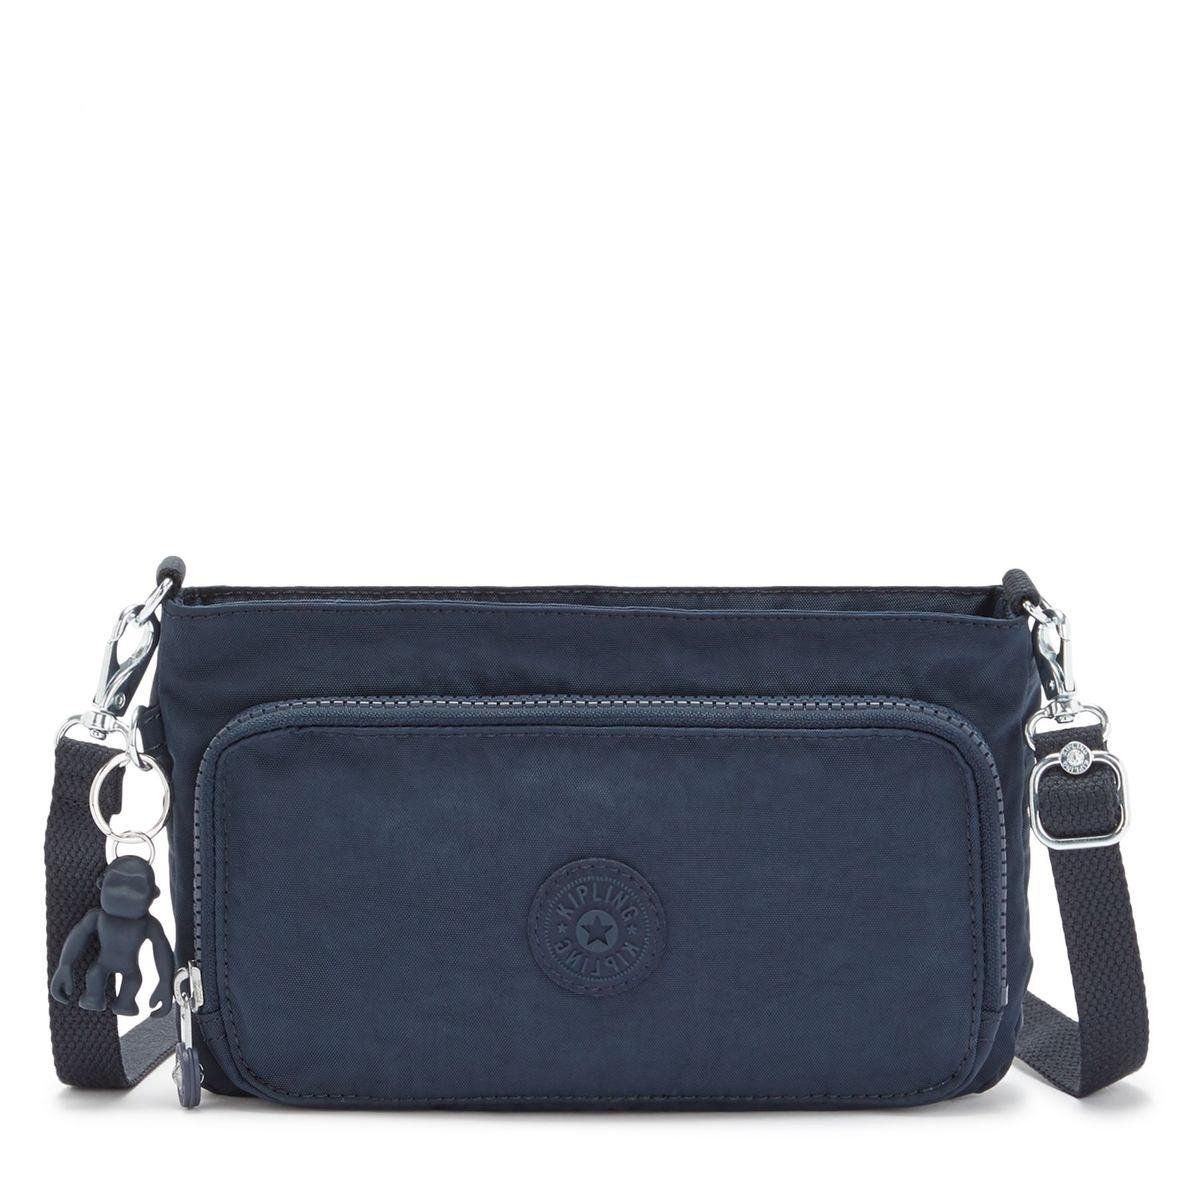 Kipling Τσαντάκι  Ωμου Crossbody 24x14.5x4.5cm Myrte Blue